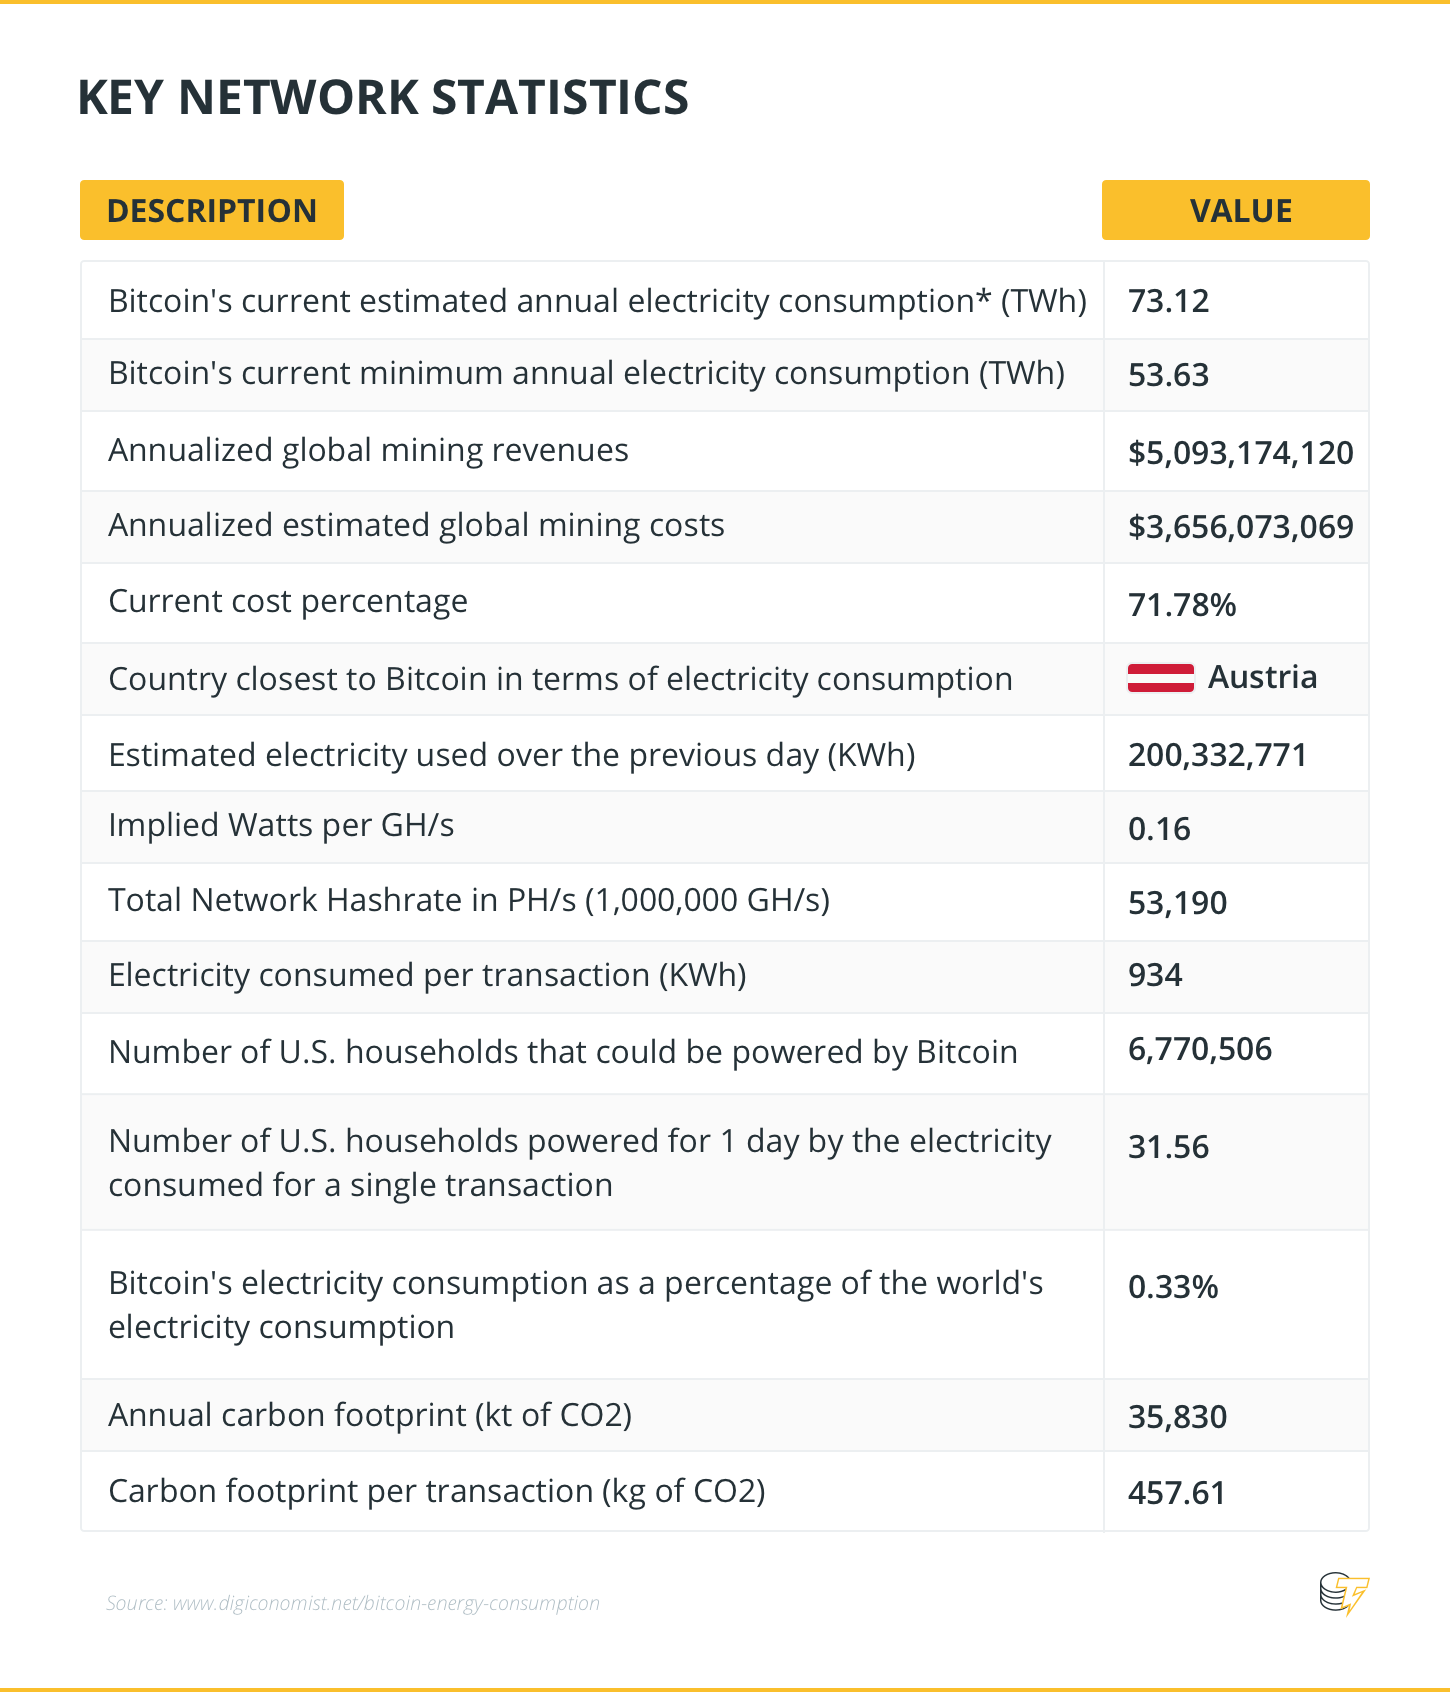 Key Network Statistics